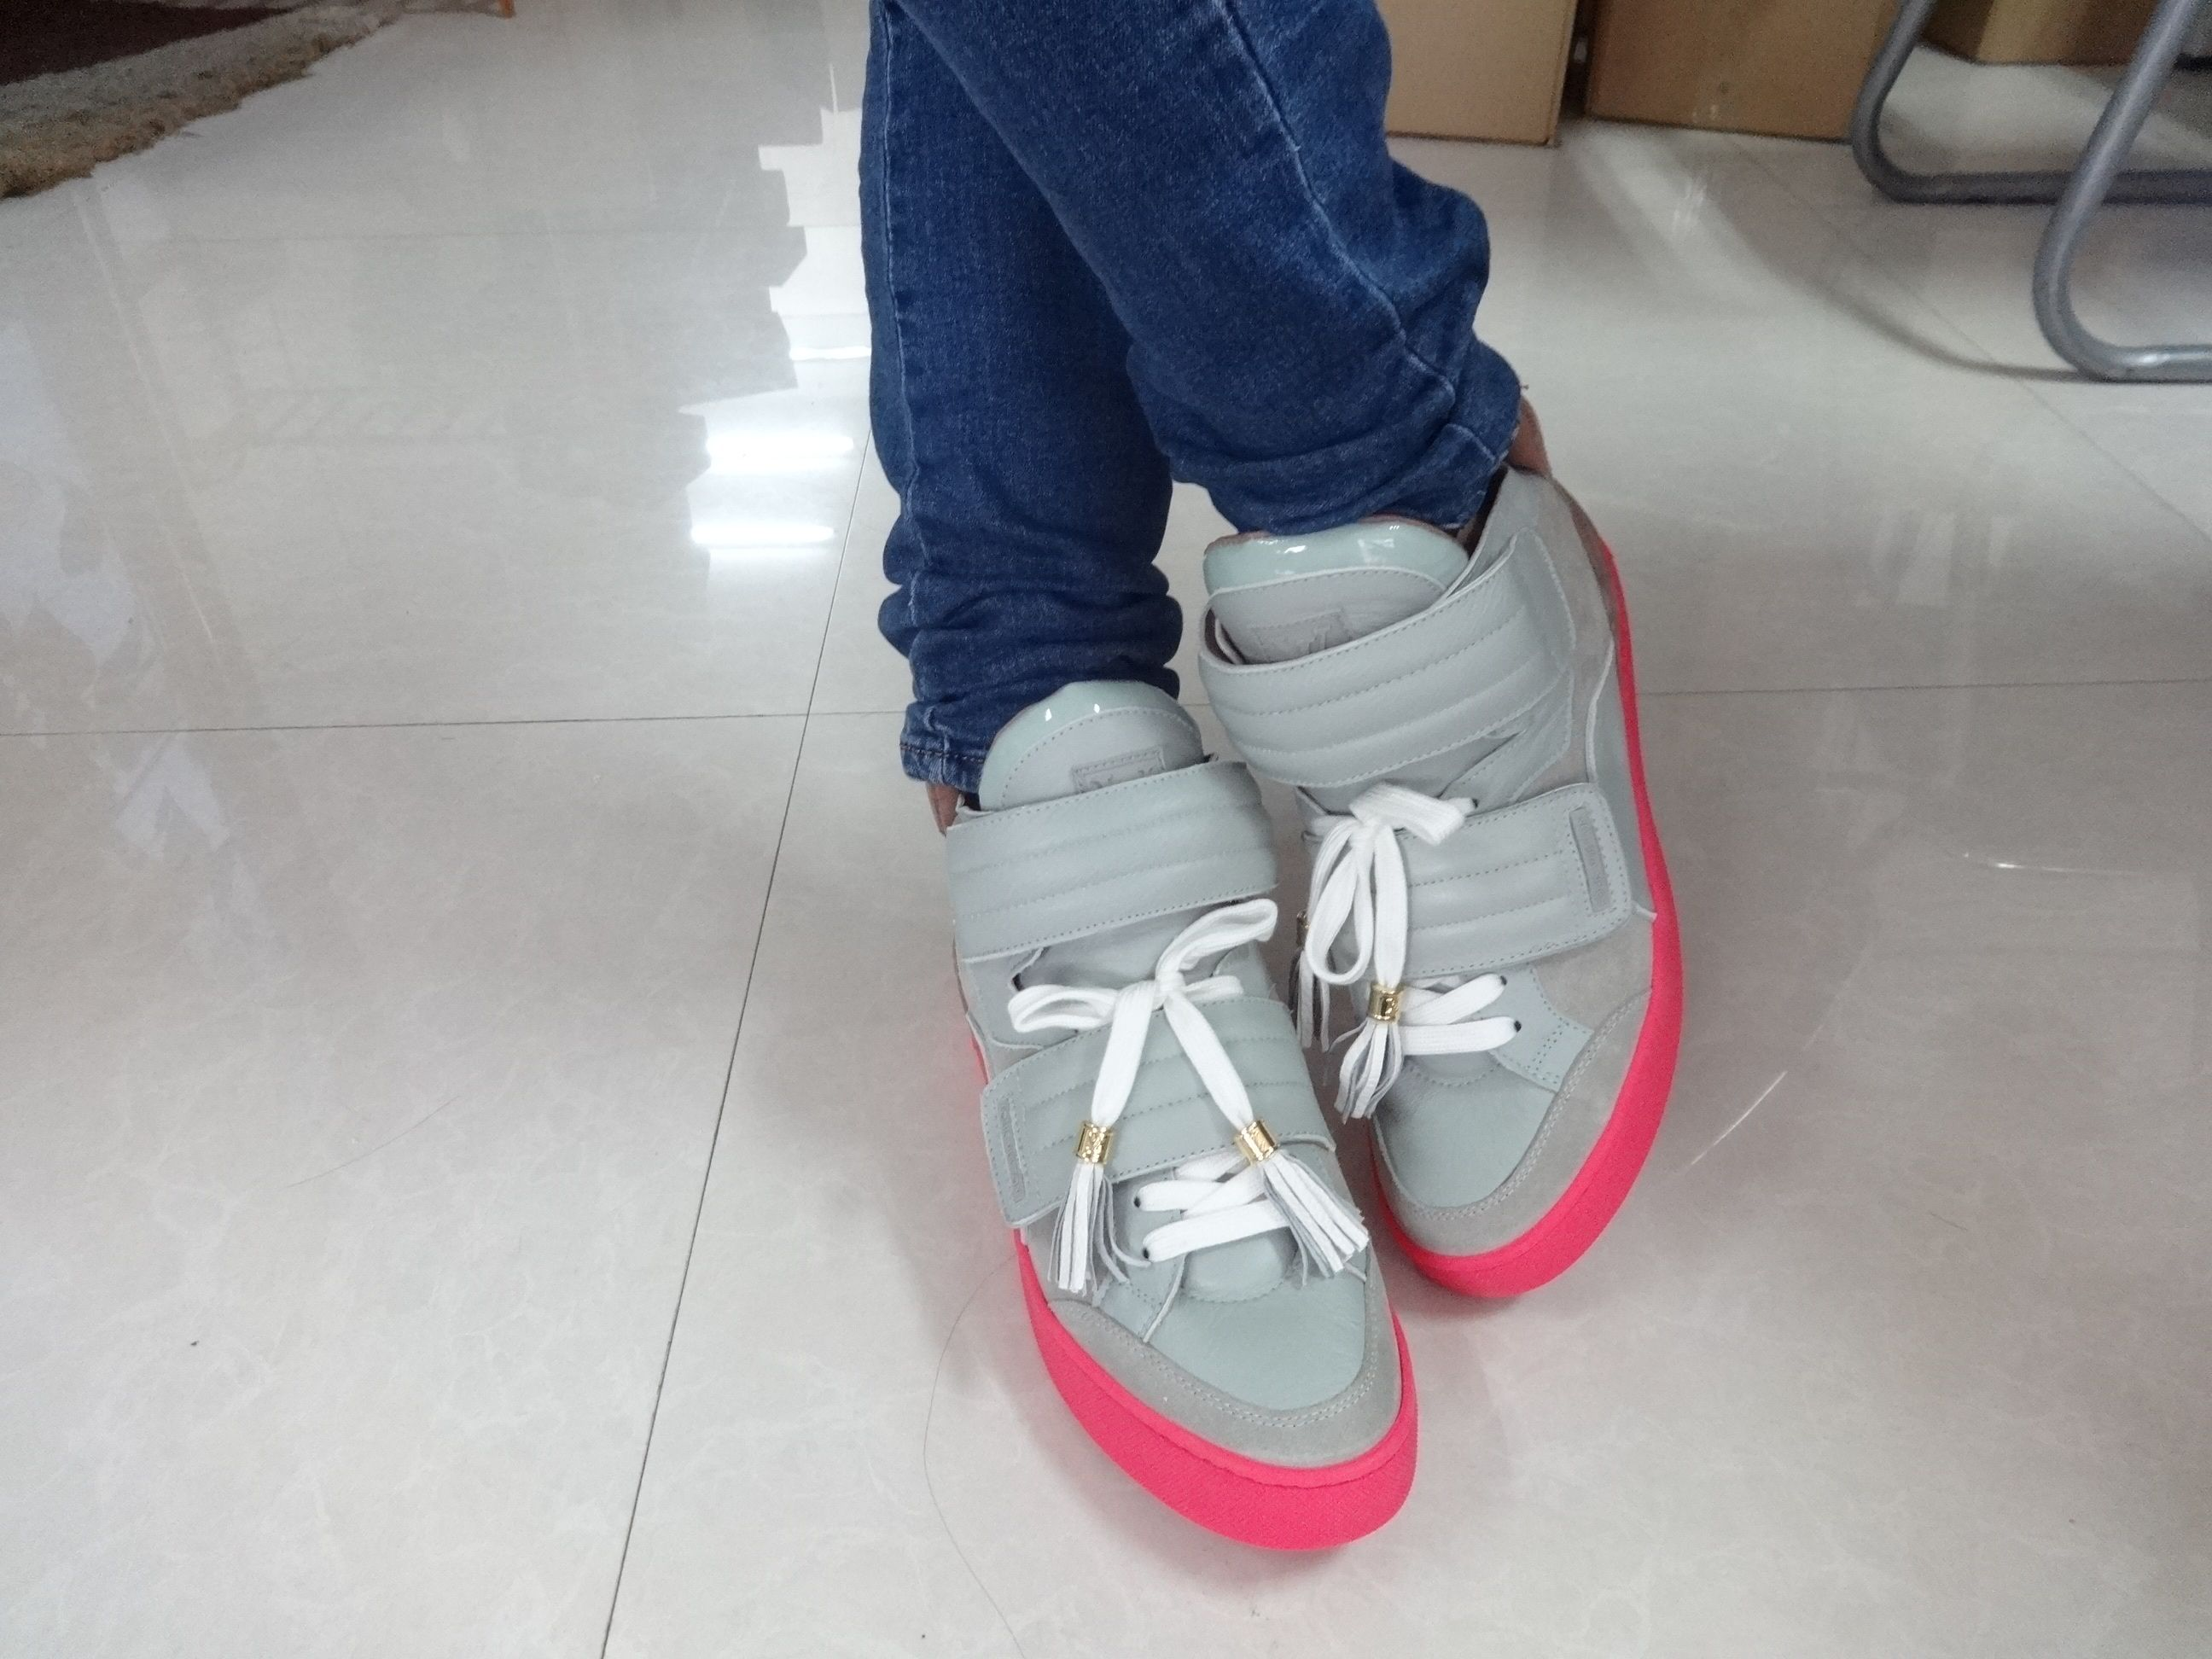 Louis Vuitton X Kanye West Jasper Amy Wears On Feet Fashion Shoes Shoe Brands Shoes